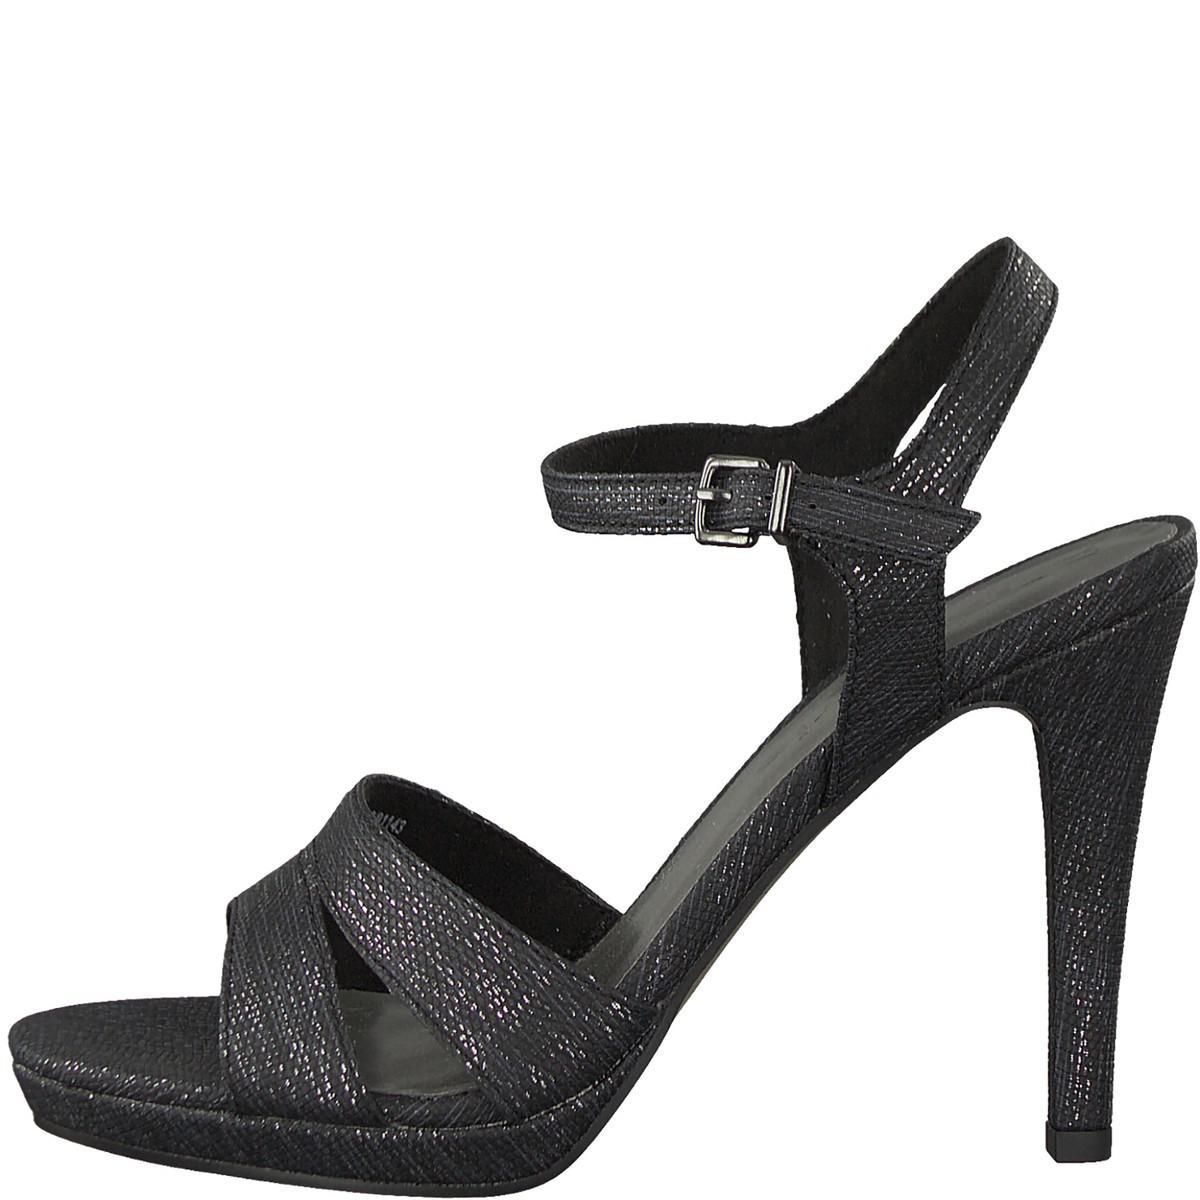 cheap sale get authentic huge surprise TAMARIS Myggia High Heel Sandals wiki cheap online discount 2014 new best sale online bmEtIkQ